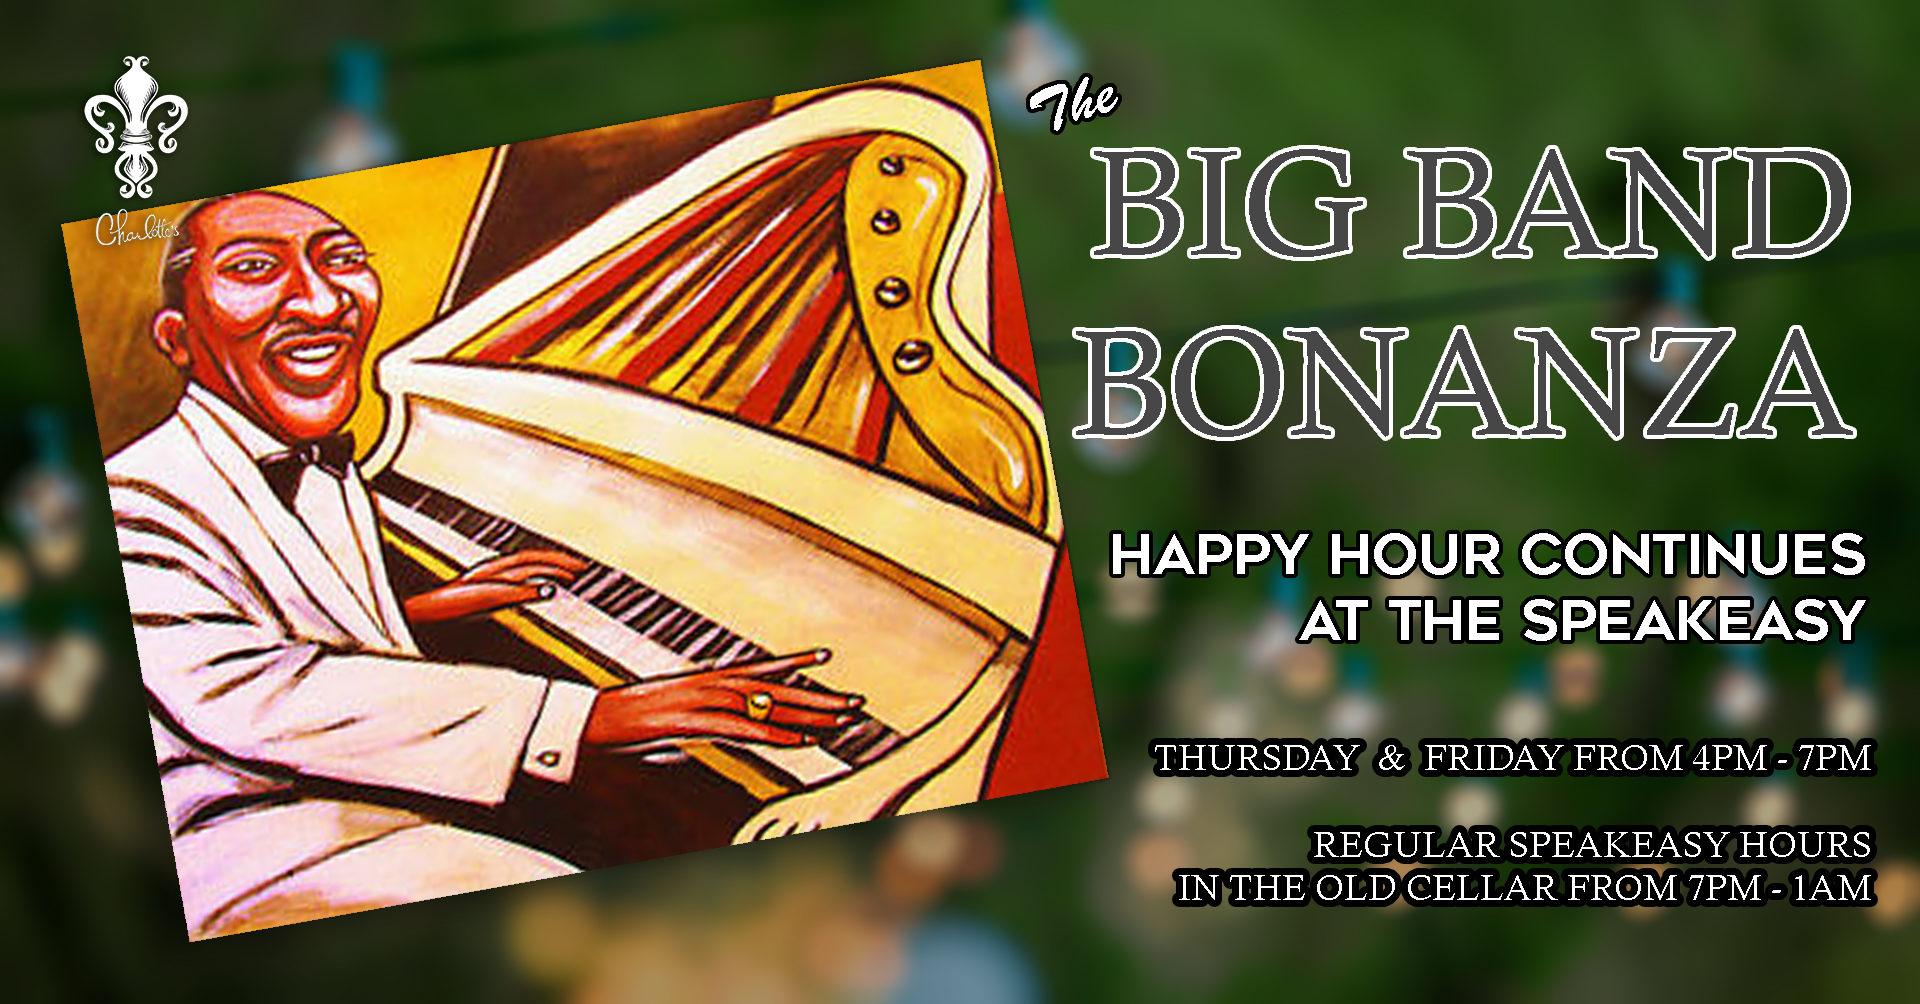 The Big Band Bonanza  sc 1 st  Charlotteu0027s Speakeasy & The Big Band Bonanza | Charlotteu0027s Speakeasy | Spirits u0026 Entertainment